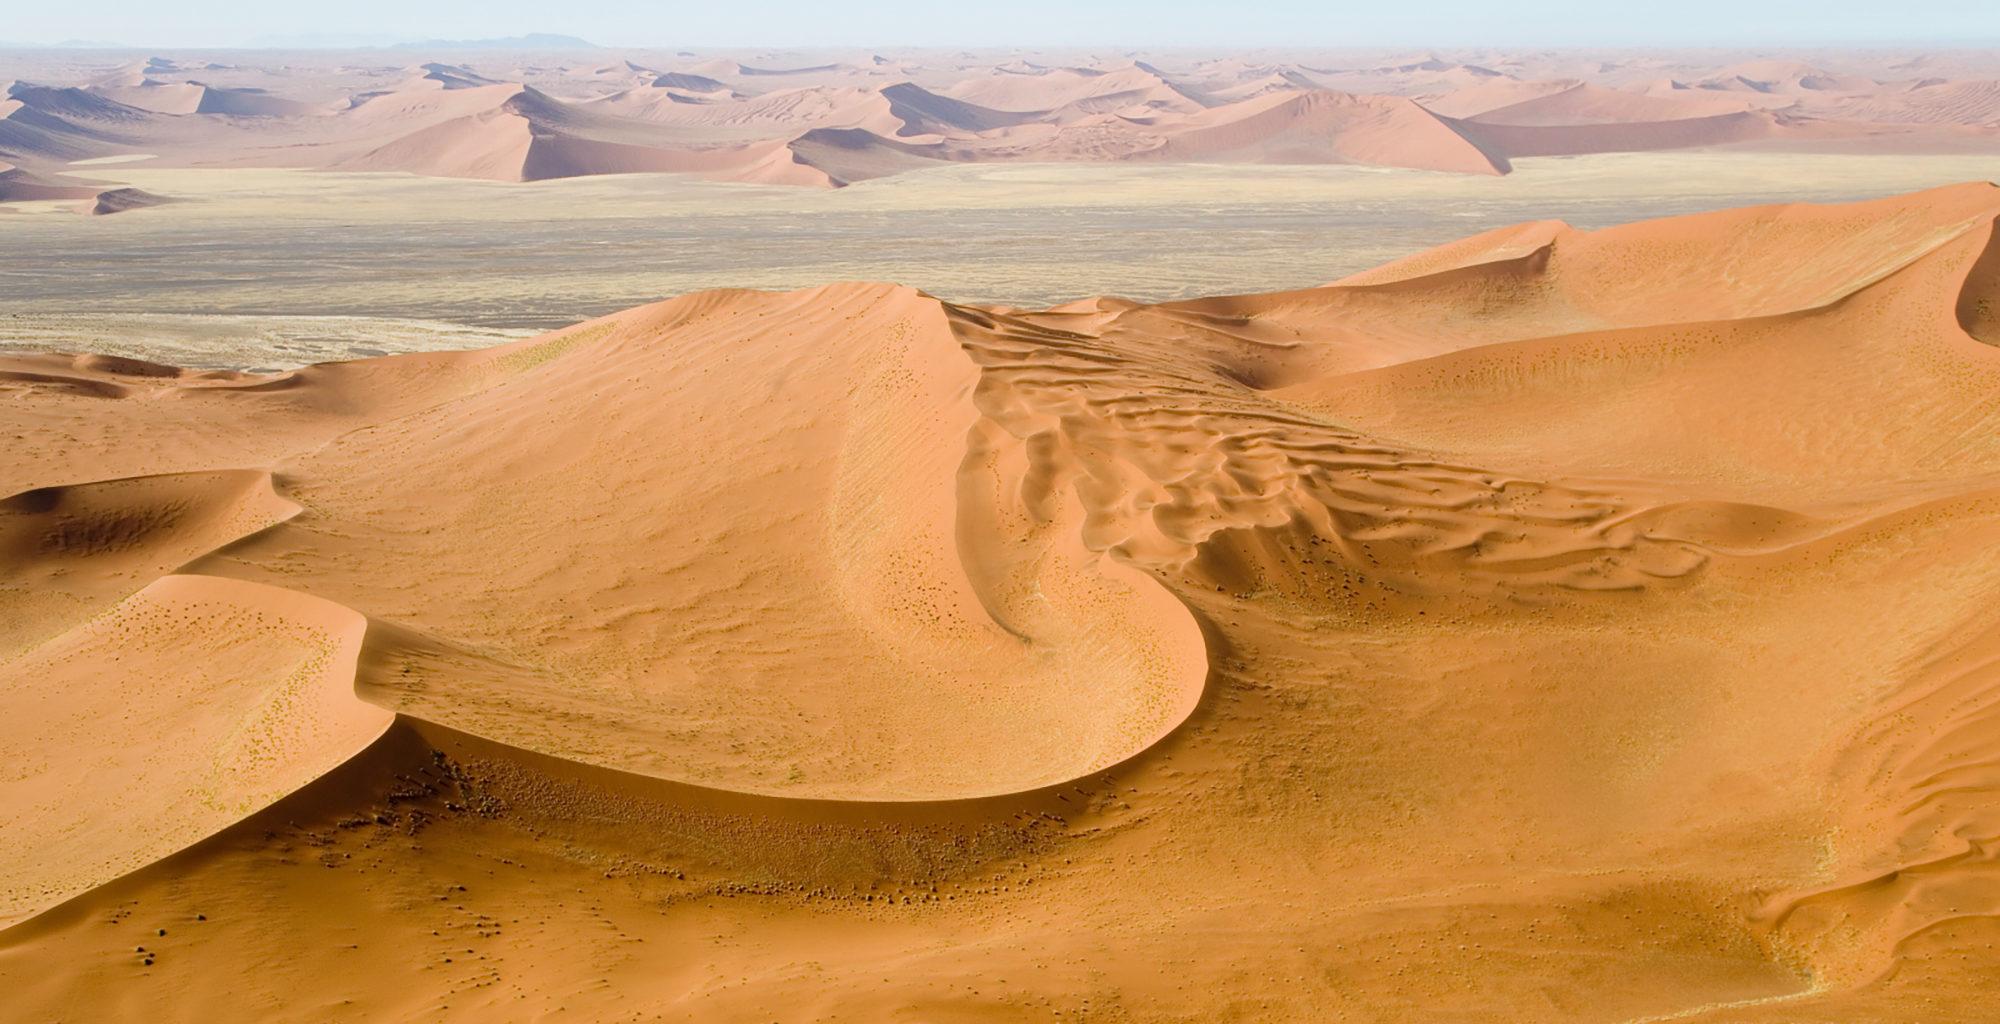 Namibia-Skeleton-Coast-Landscape-Aerial